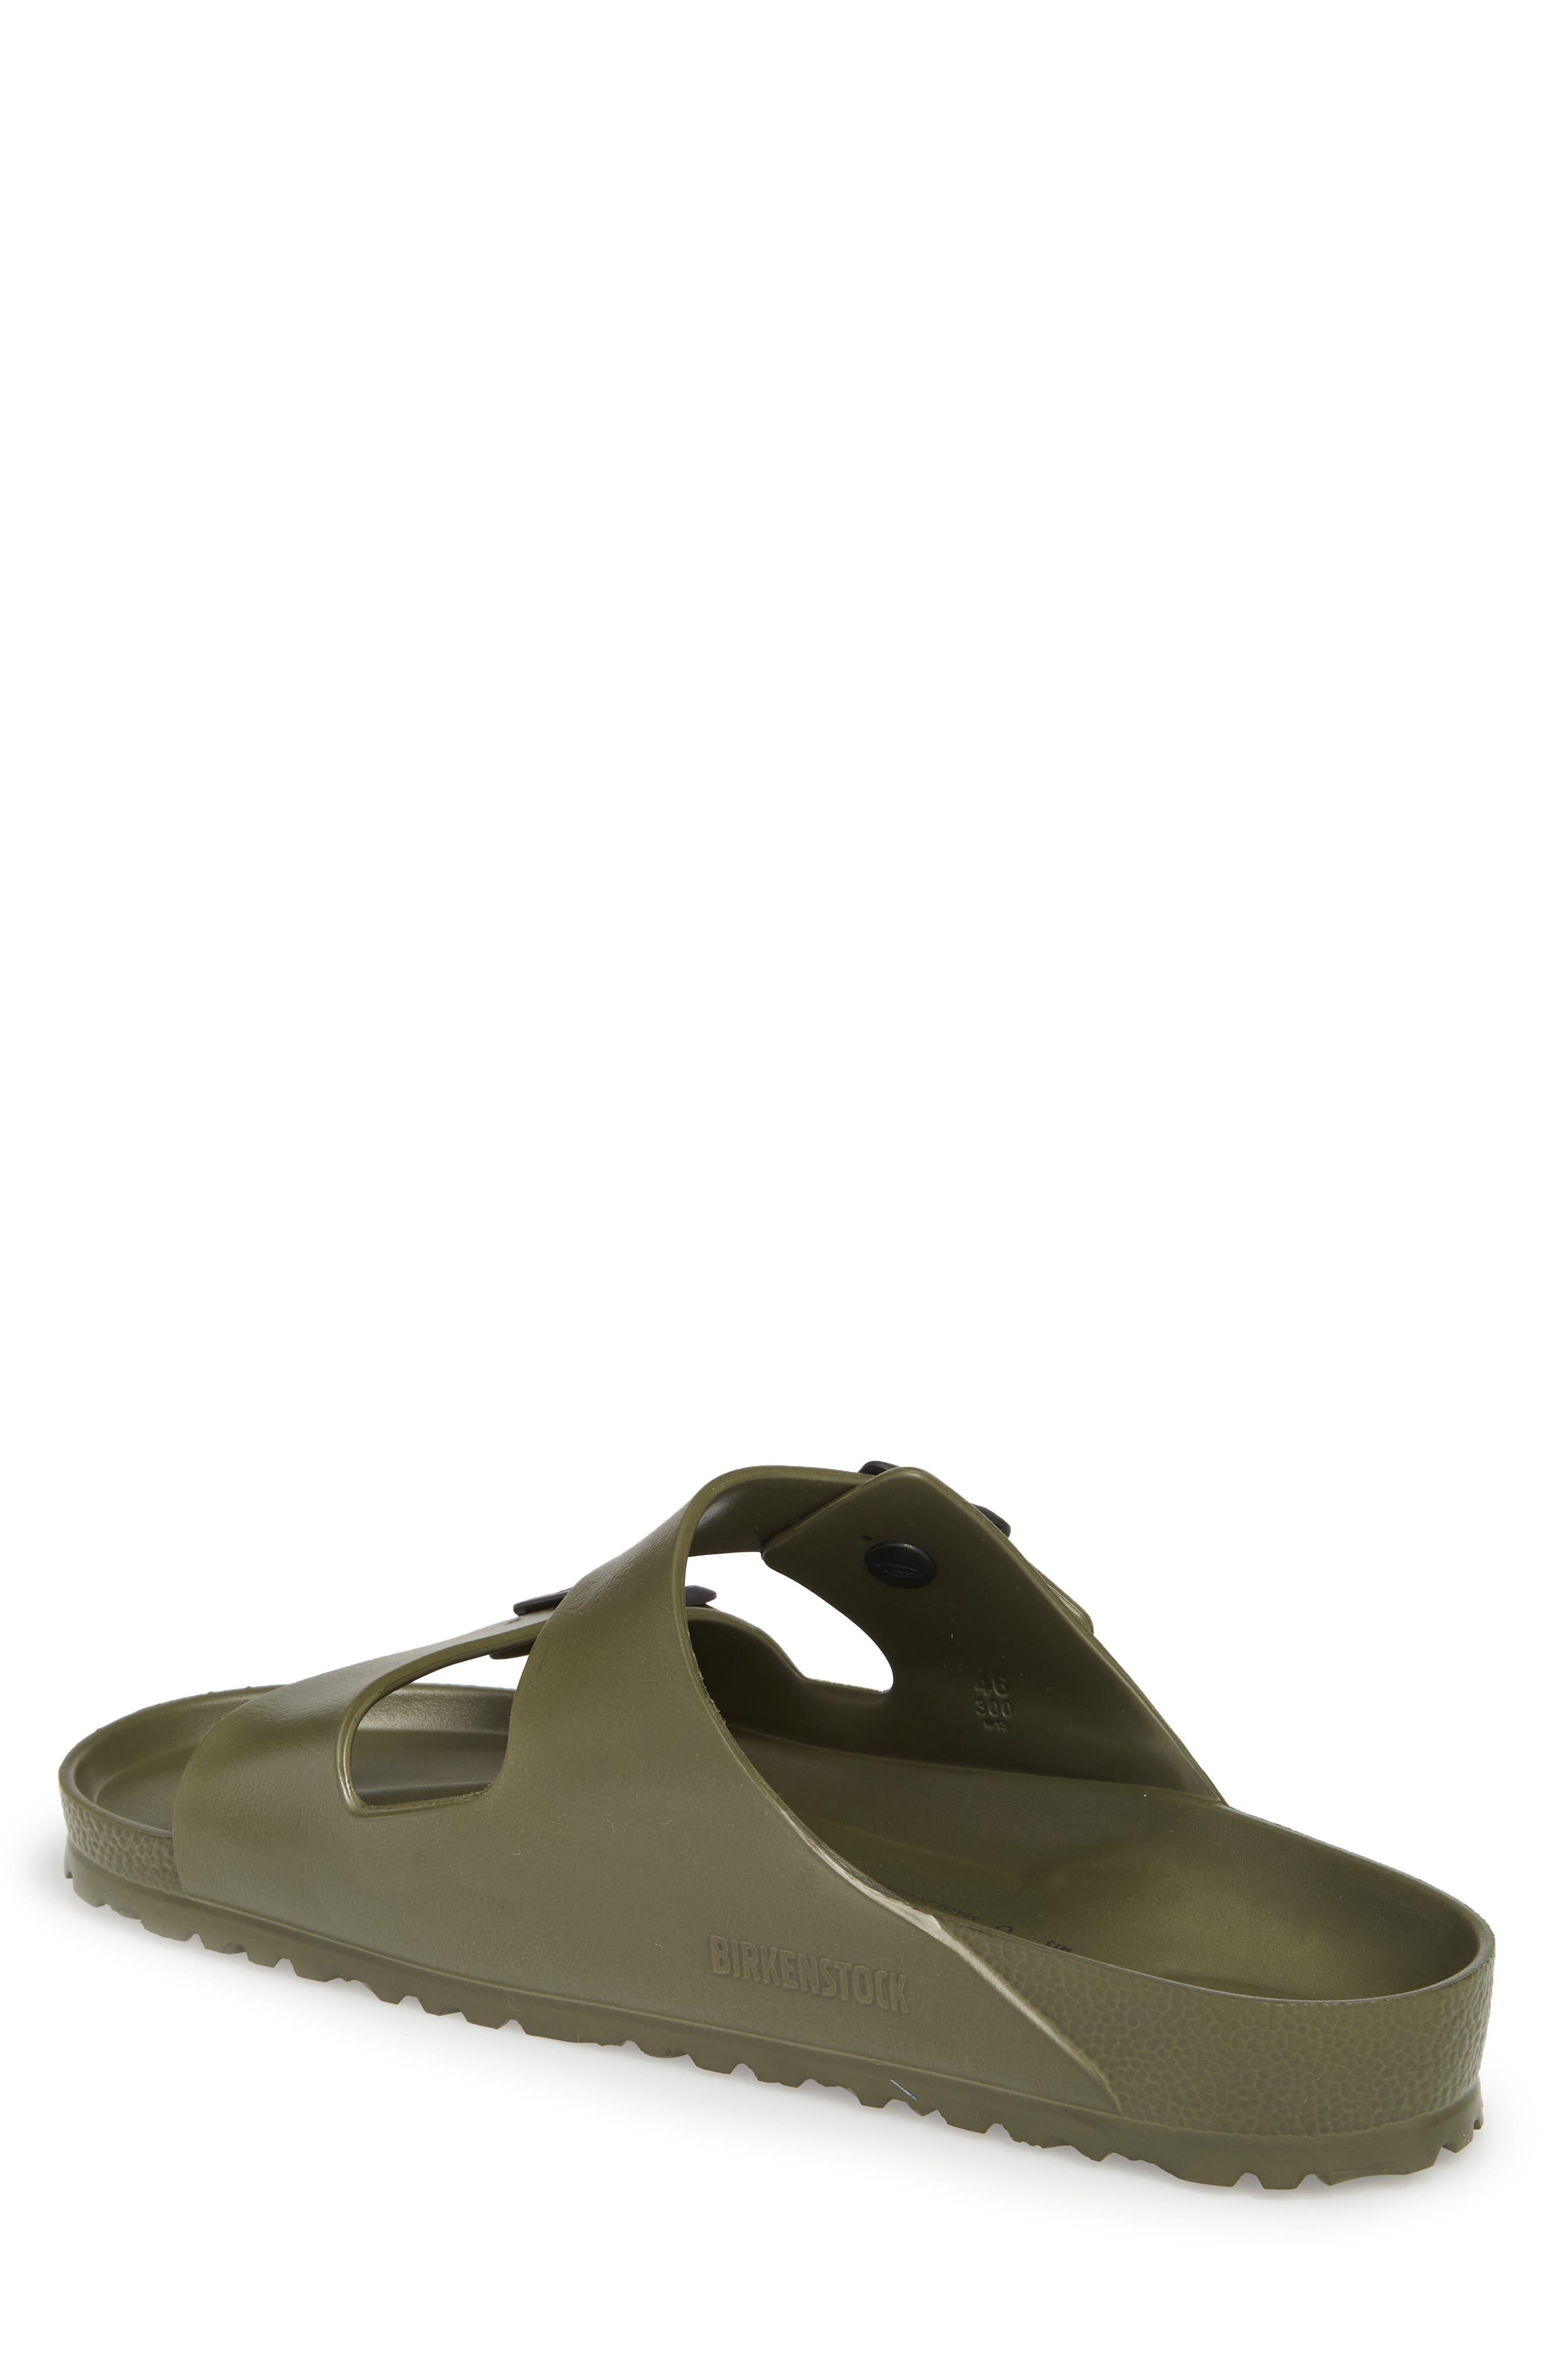 'Essentials - Arizona EVA' Waterproof Slide Sandal,                             Alternate thumbnail 3, color,                             GREEN